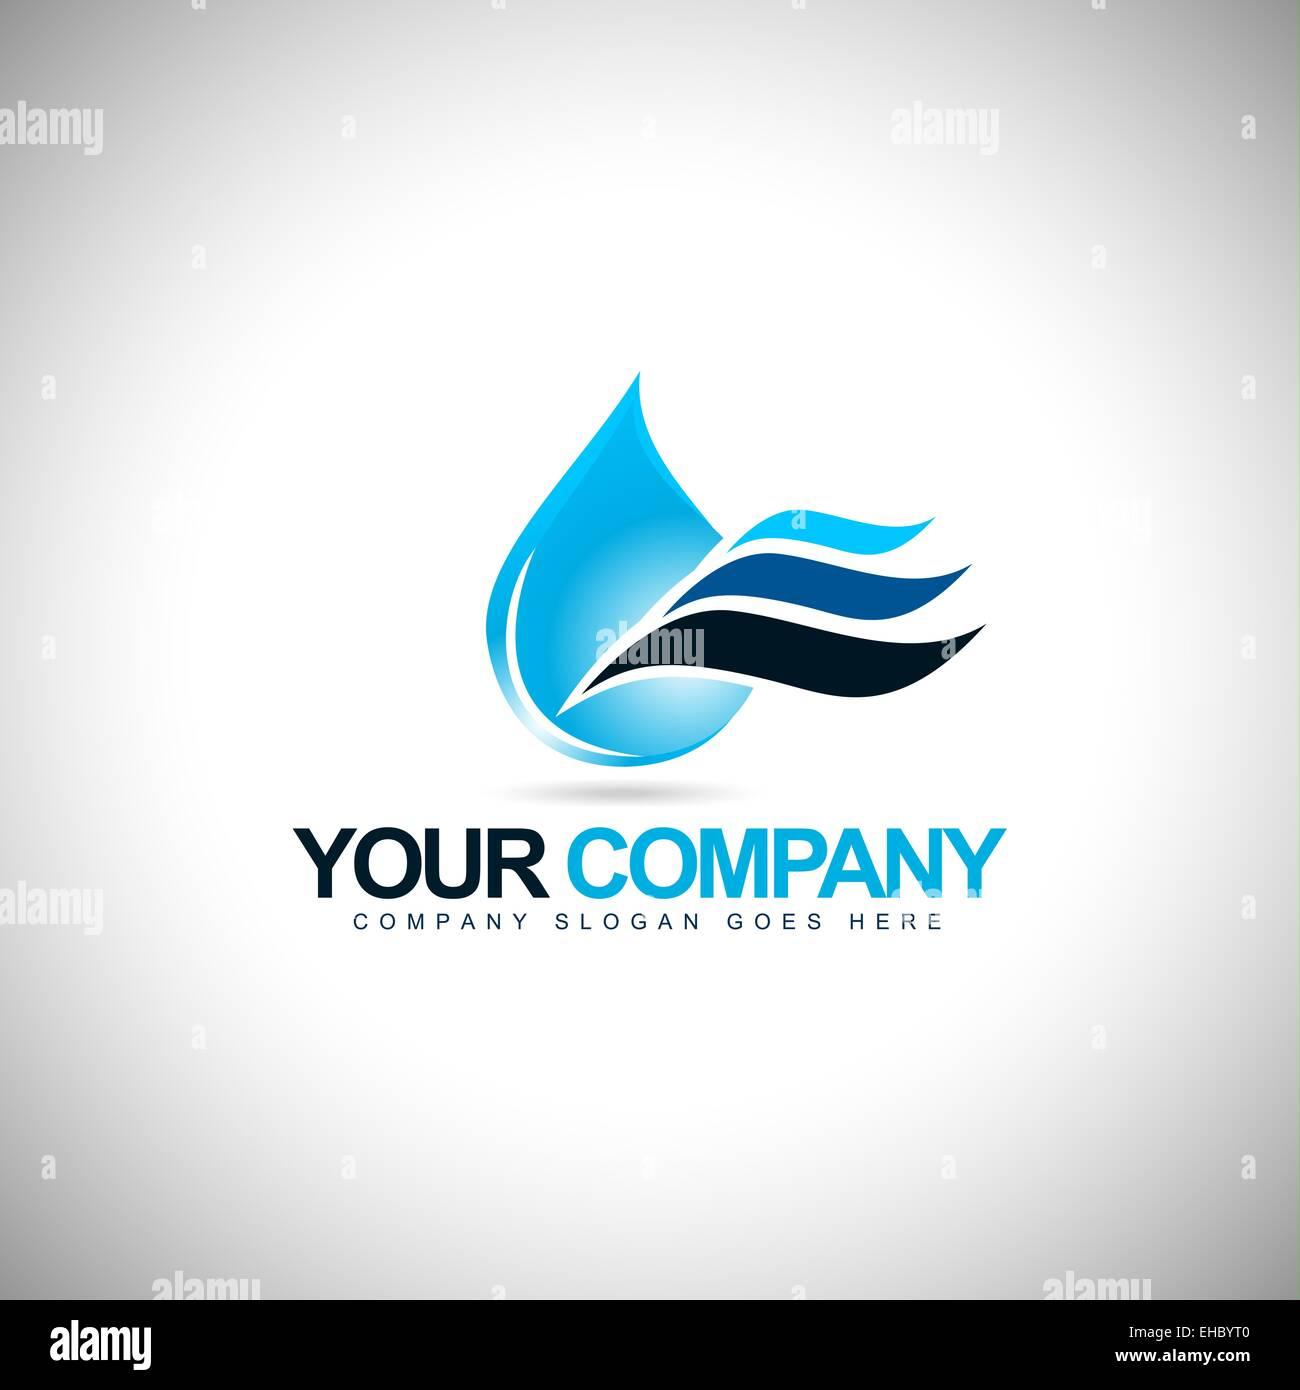 water drop icon logo design creative logo of a water drop toyota rav4 logo vector toyota logo vector png